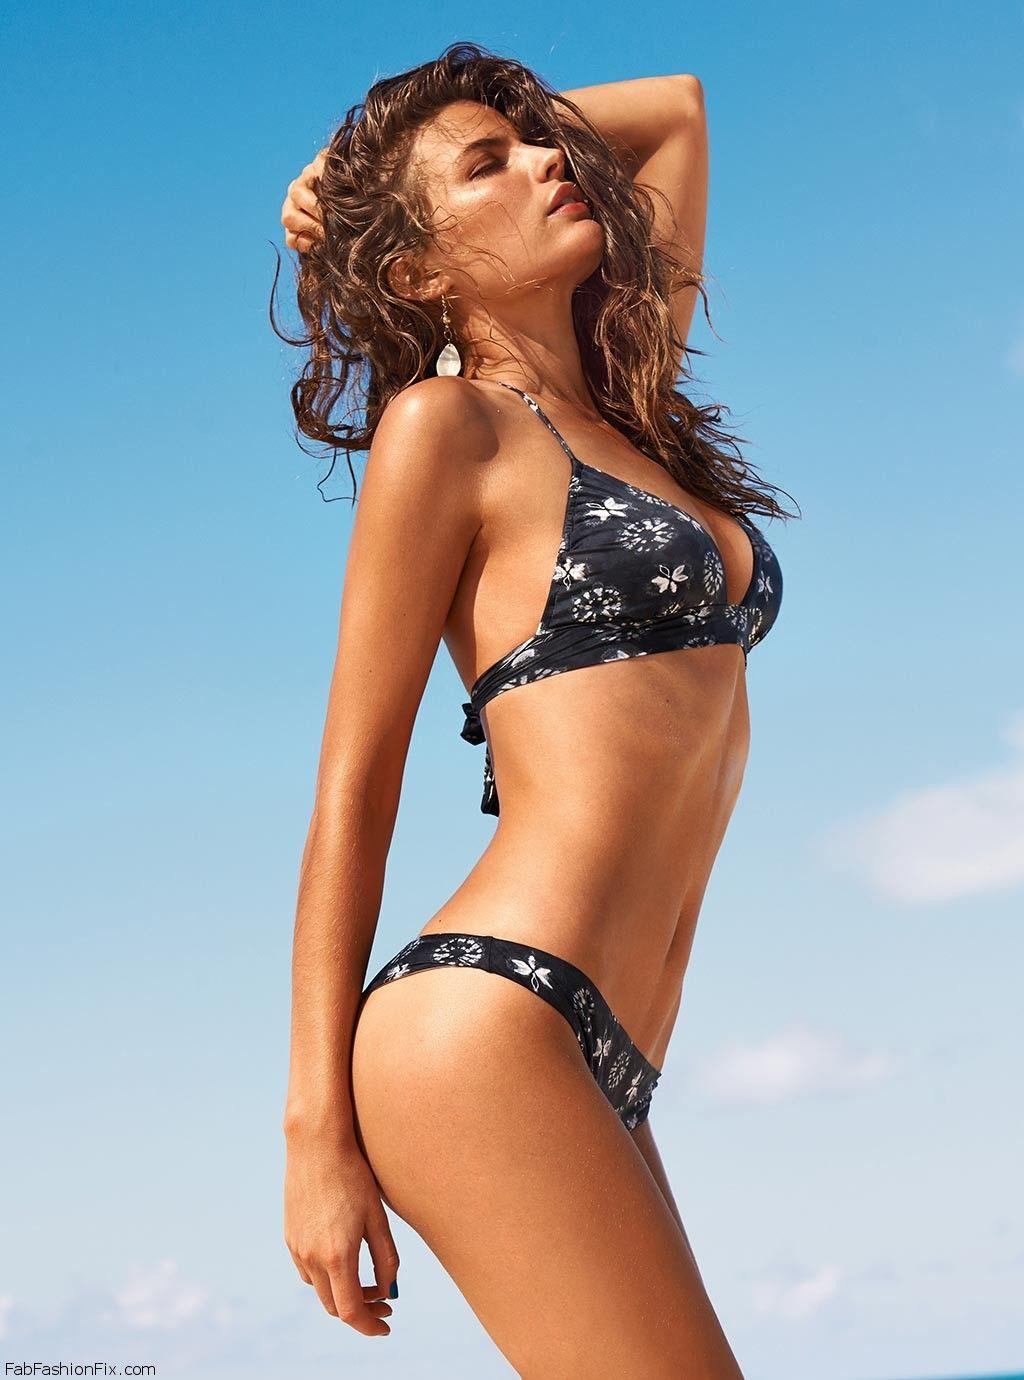 calzedonia-bikini-estampado-negro-y-blanco